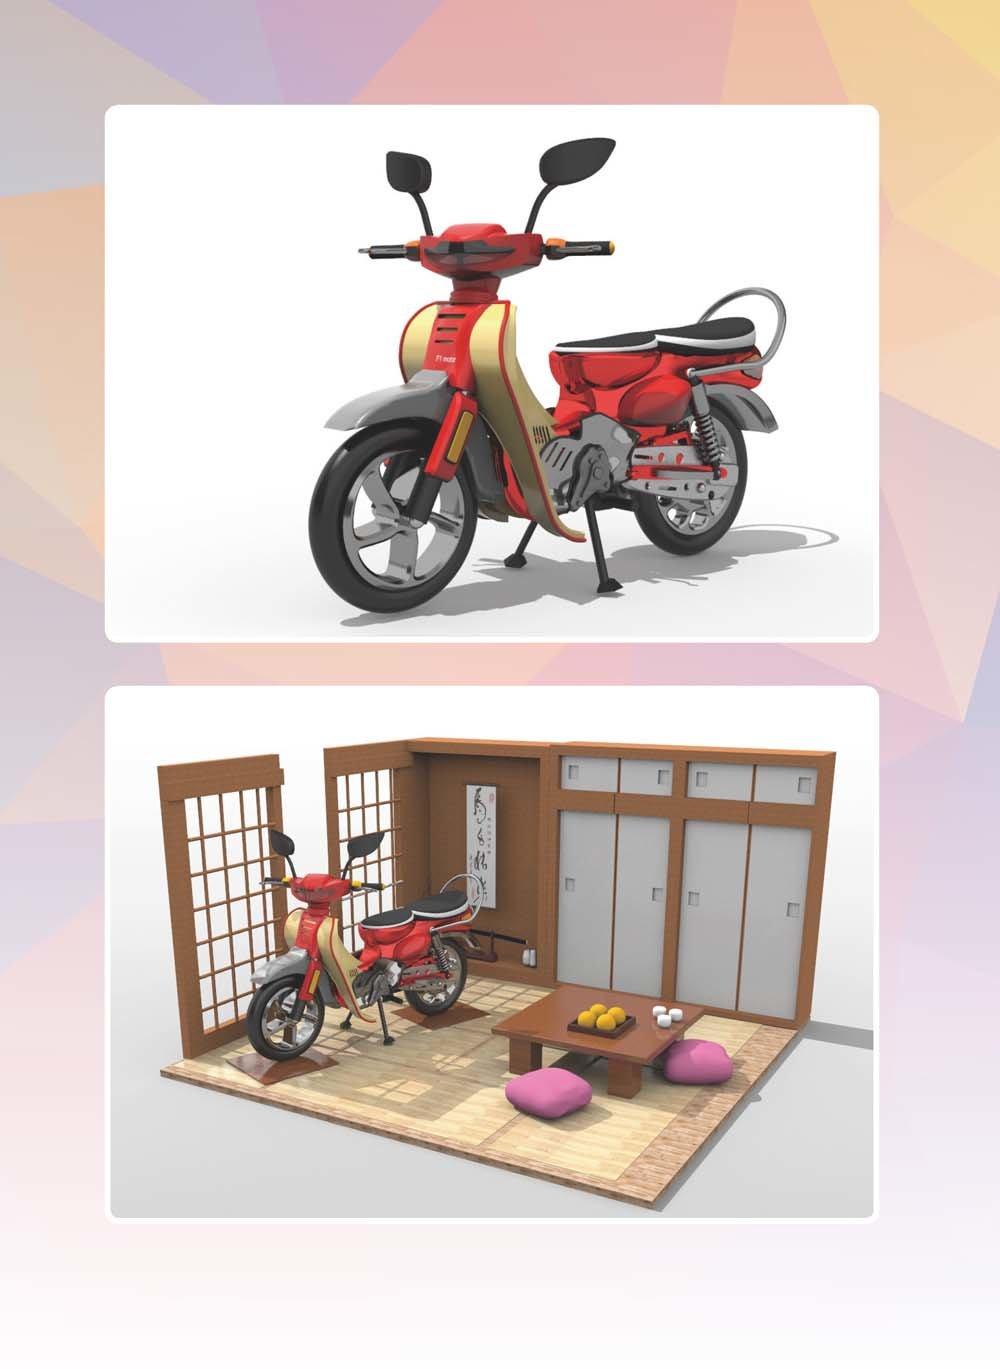 Rhinoceros 6 全攻略:自學設計與 3D建模寶典-preview-11